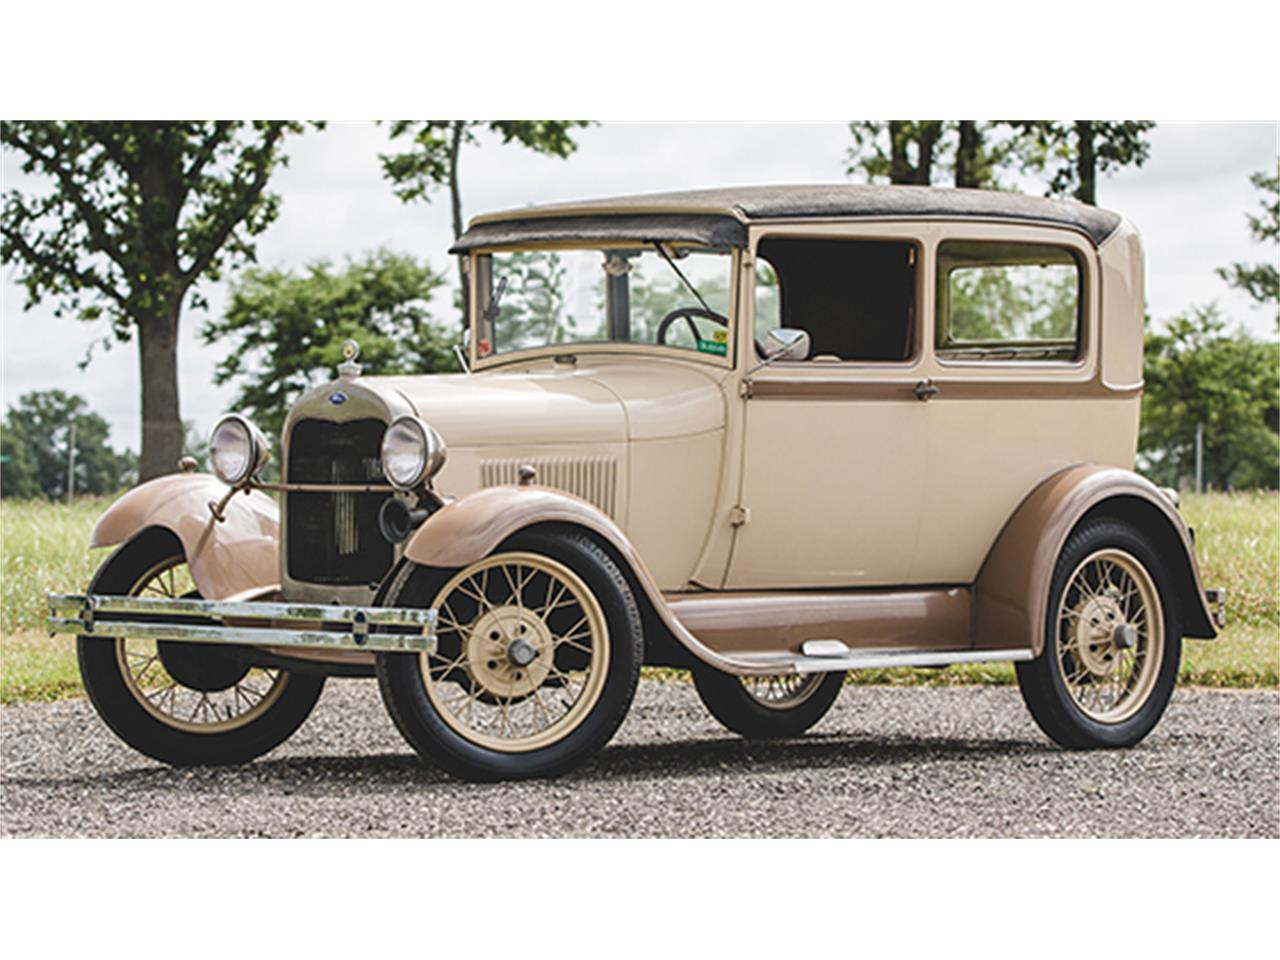 1928 Ford Model A Tudor Sedan For Sale Classiccars Com Cc 887737